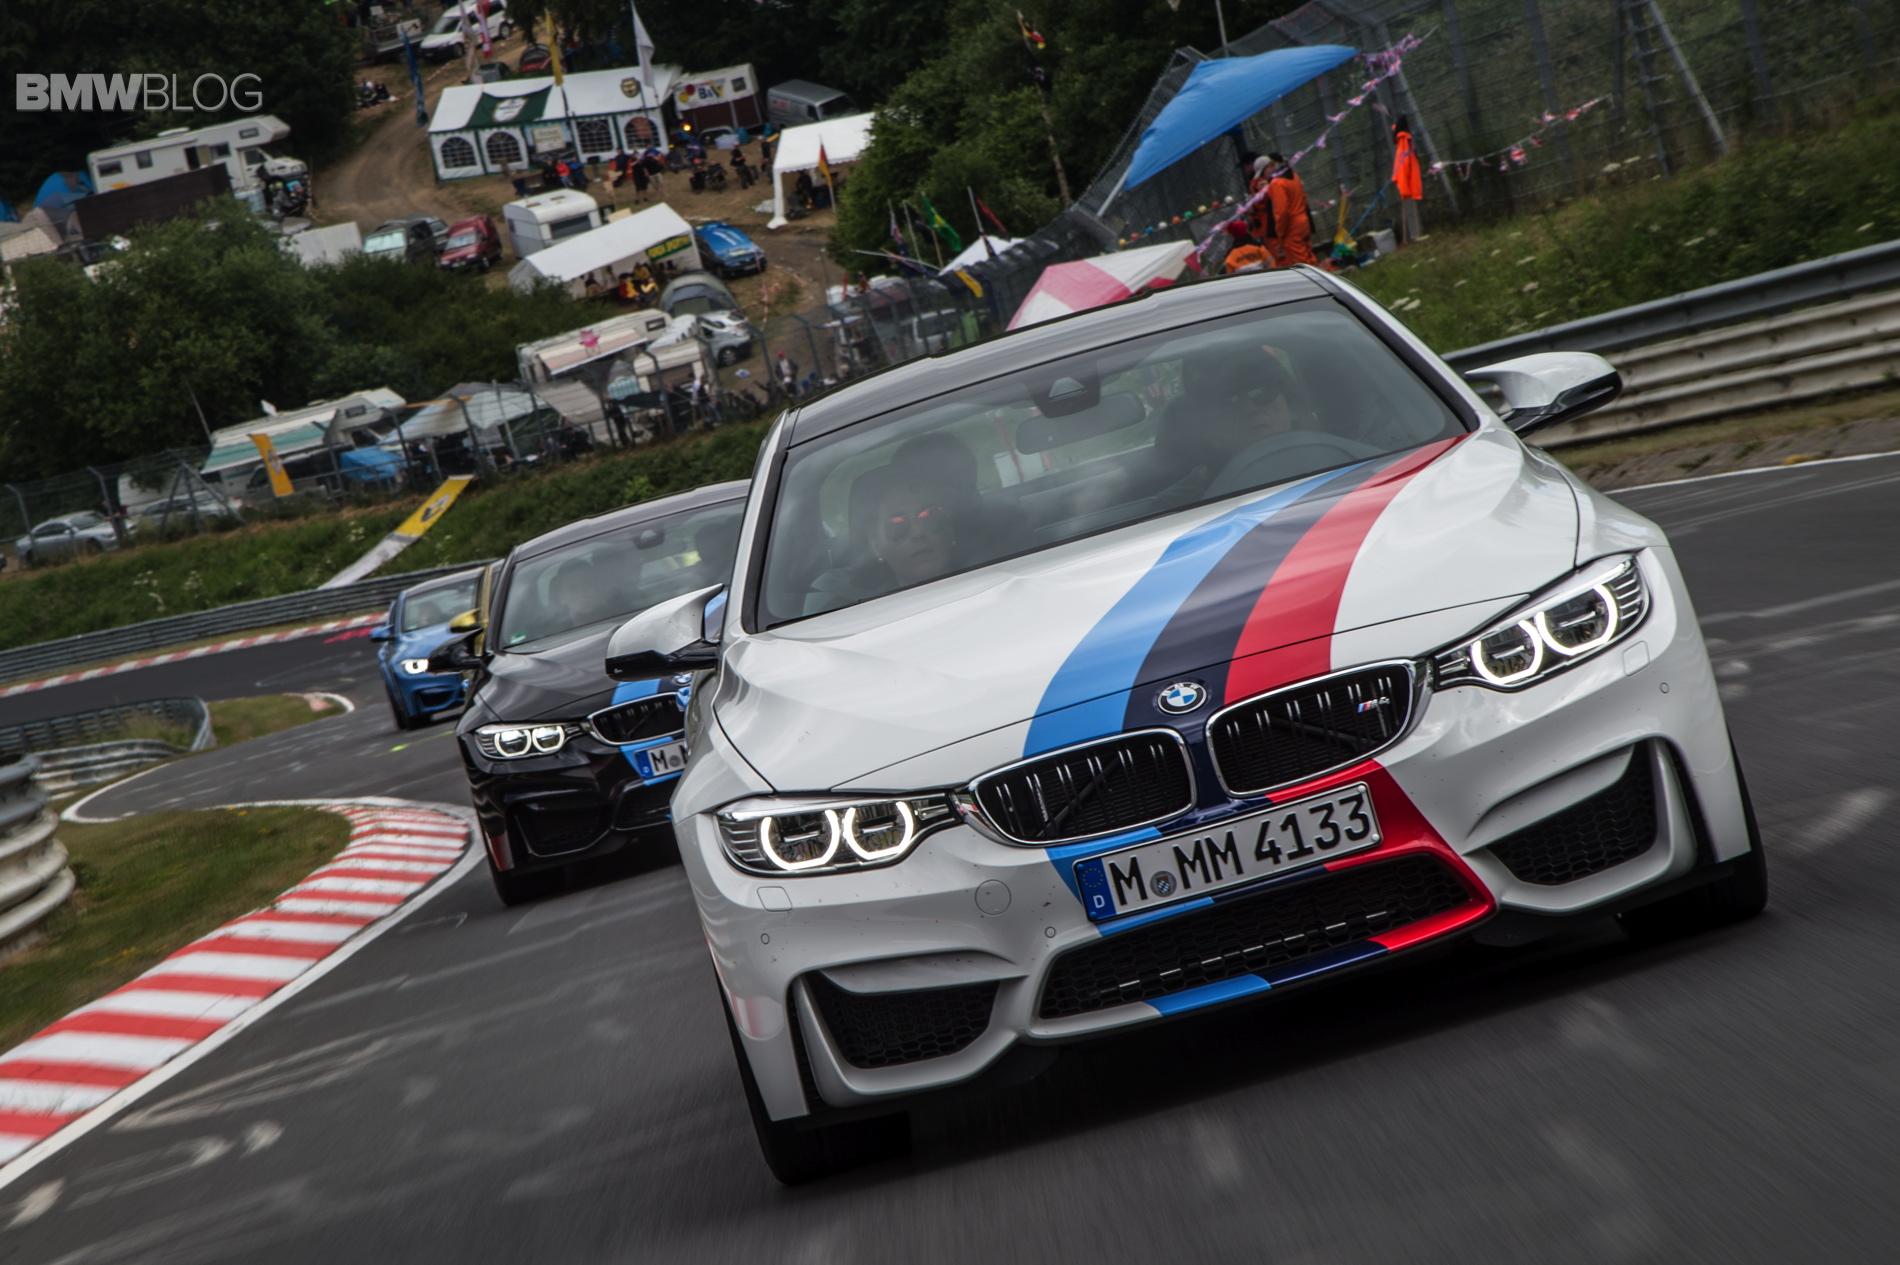 BMW M Corso 2014 19